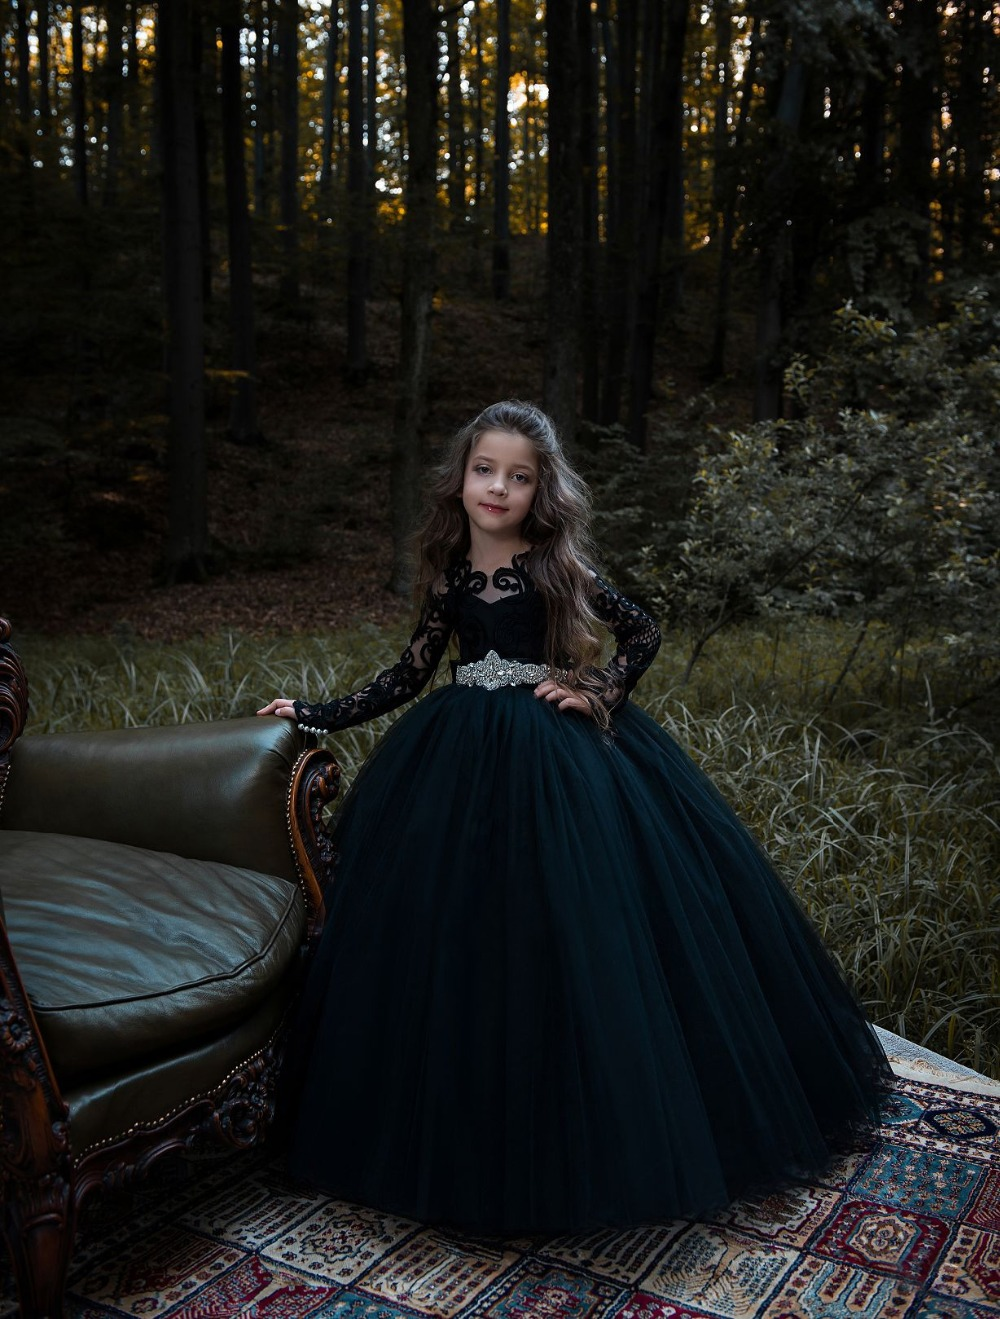 Long SleeveFlower Girl Dresses Lace Mother Daughter Dresses Tulle Children Clothing Ball Gown children clothing mother